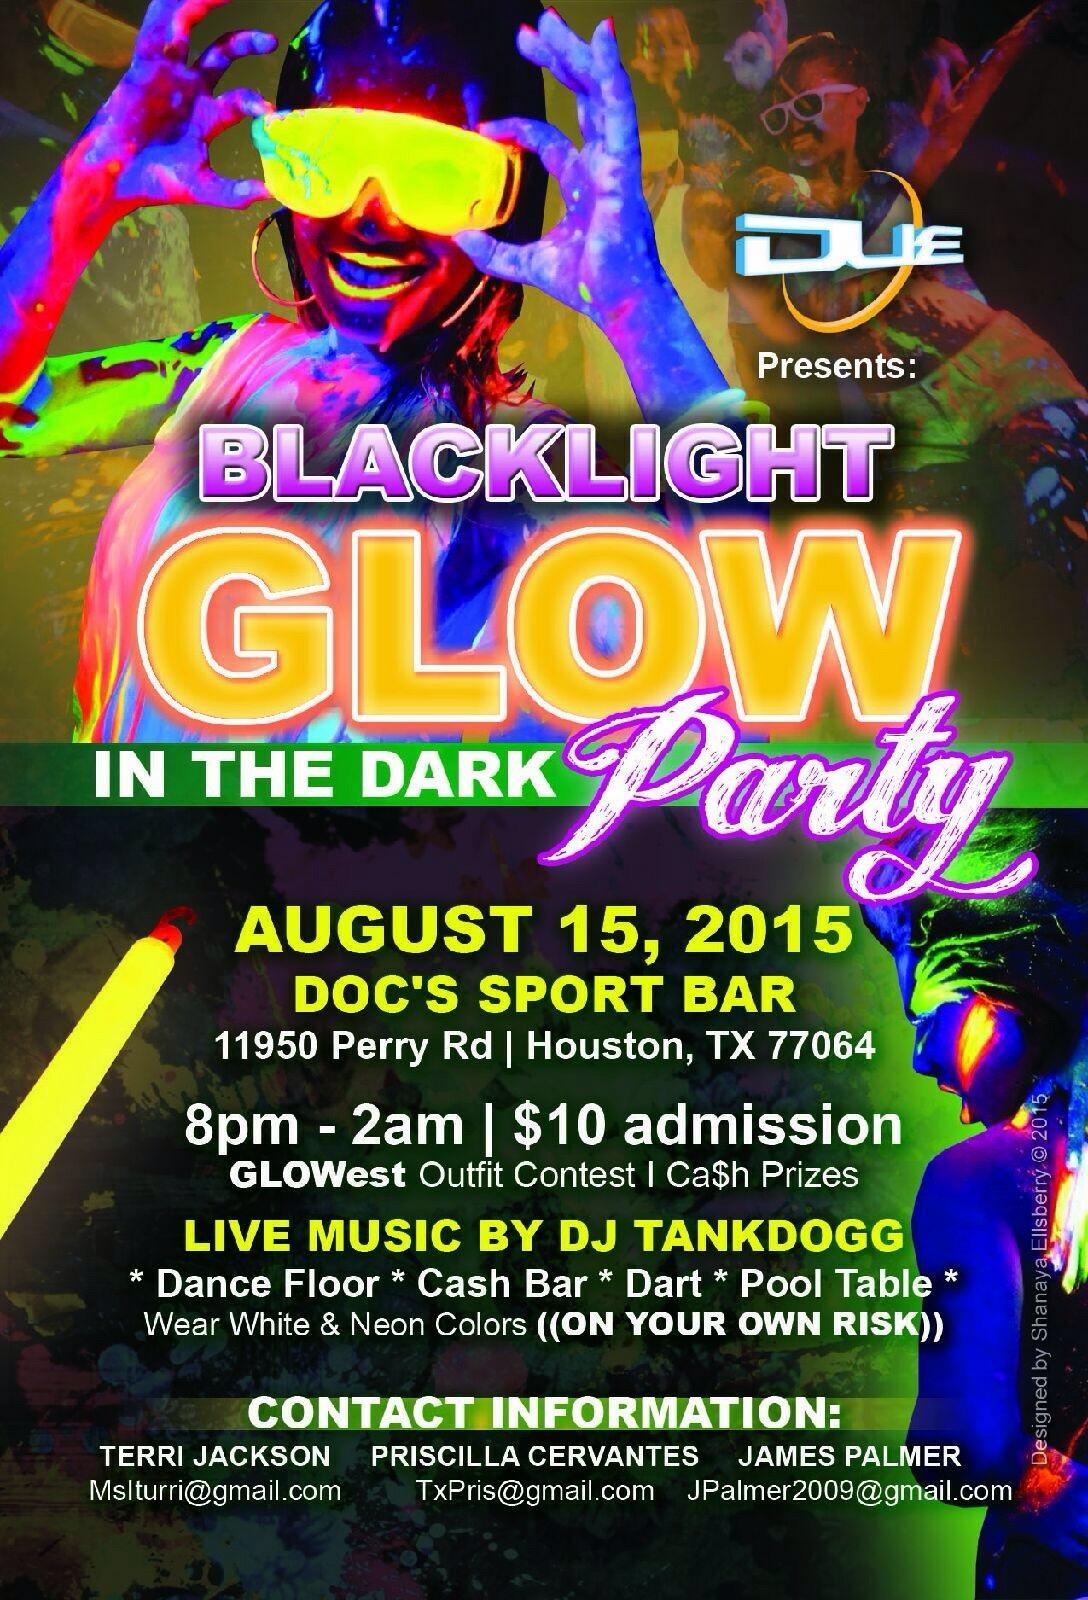 Blacklight GLOW In The Dark Party